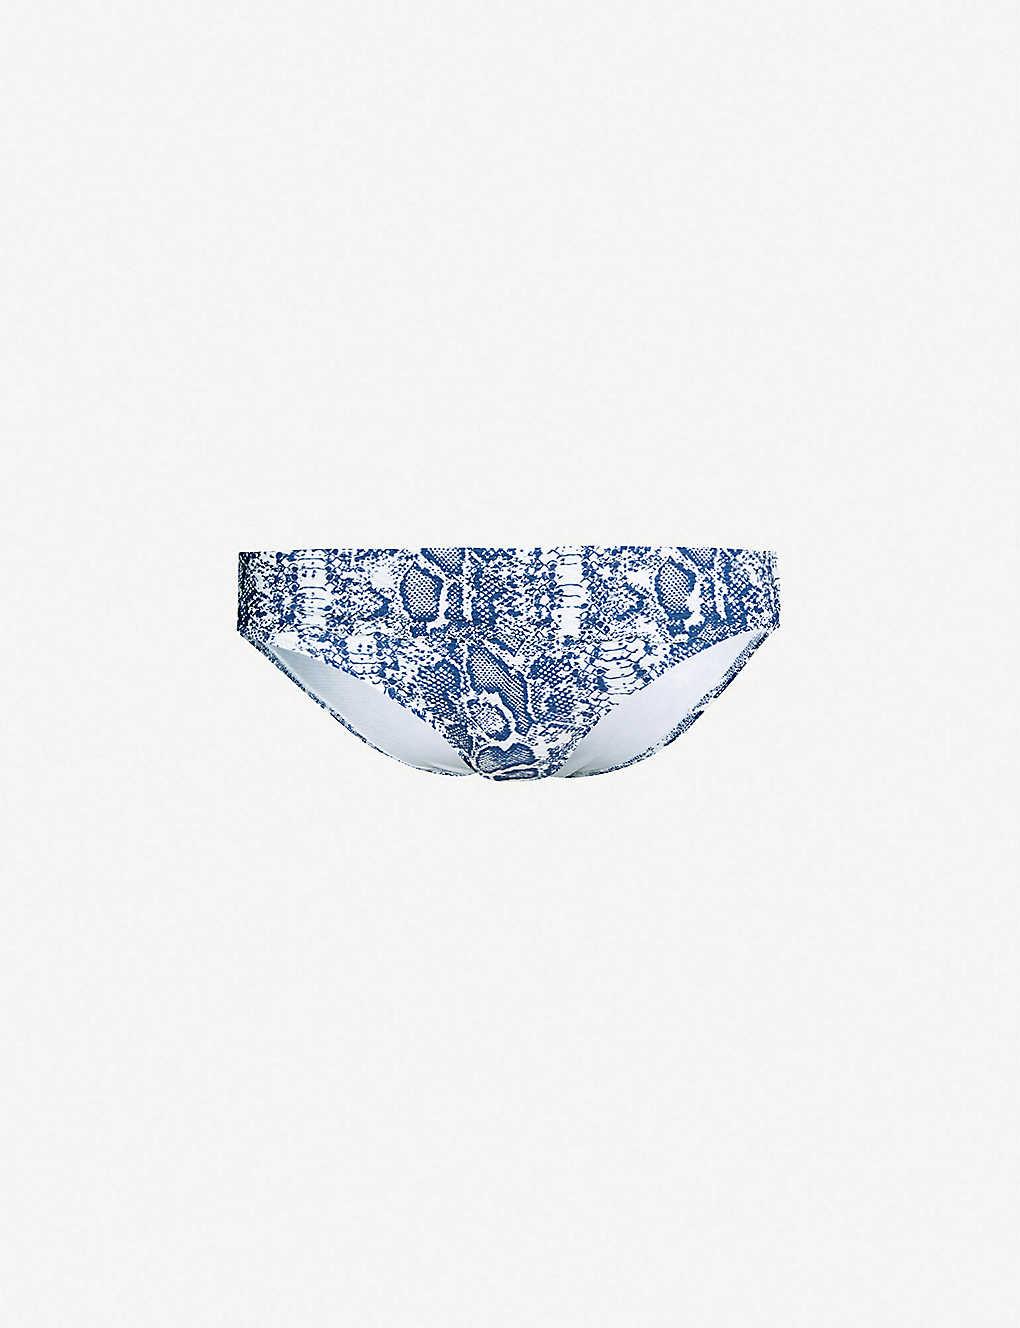 5a1a4197ea244 HEIDI KLEIN - Kenya bikini bottoms